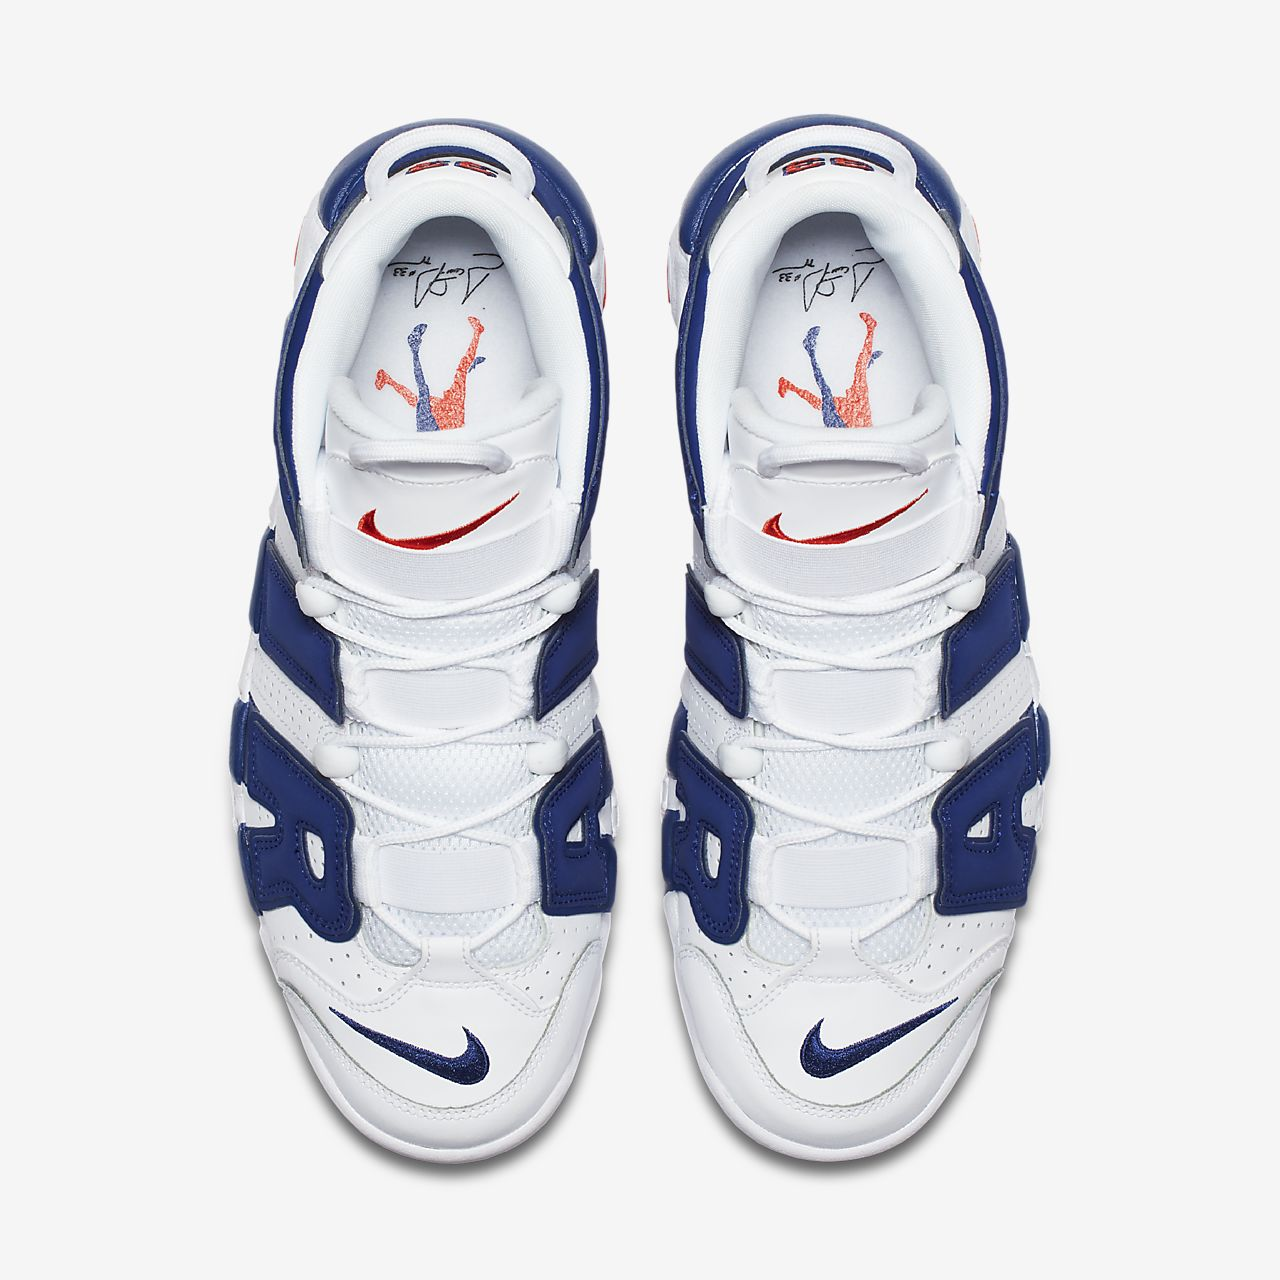 ... Nike Air More Uptempo '96 Men's Shoe